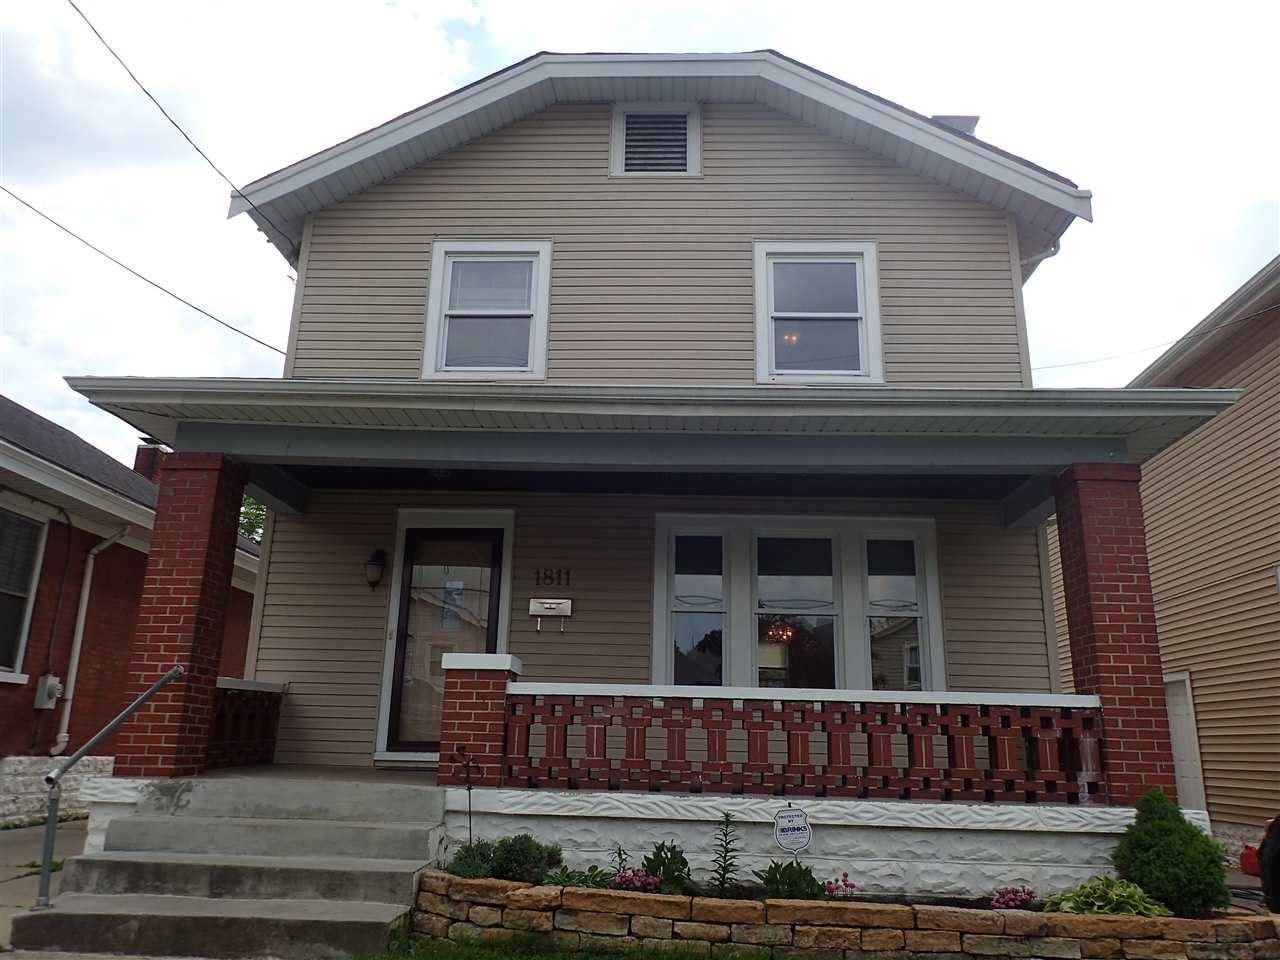 1811 Euclid Avenue, Covington, KY 41014 - #: 537736